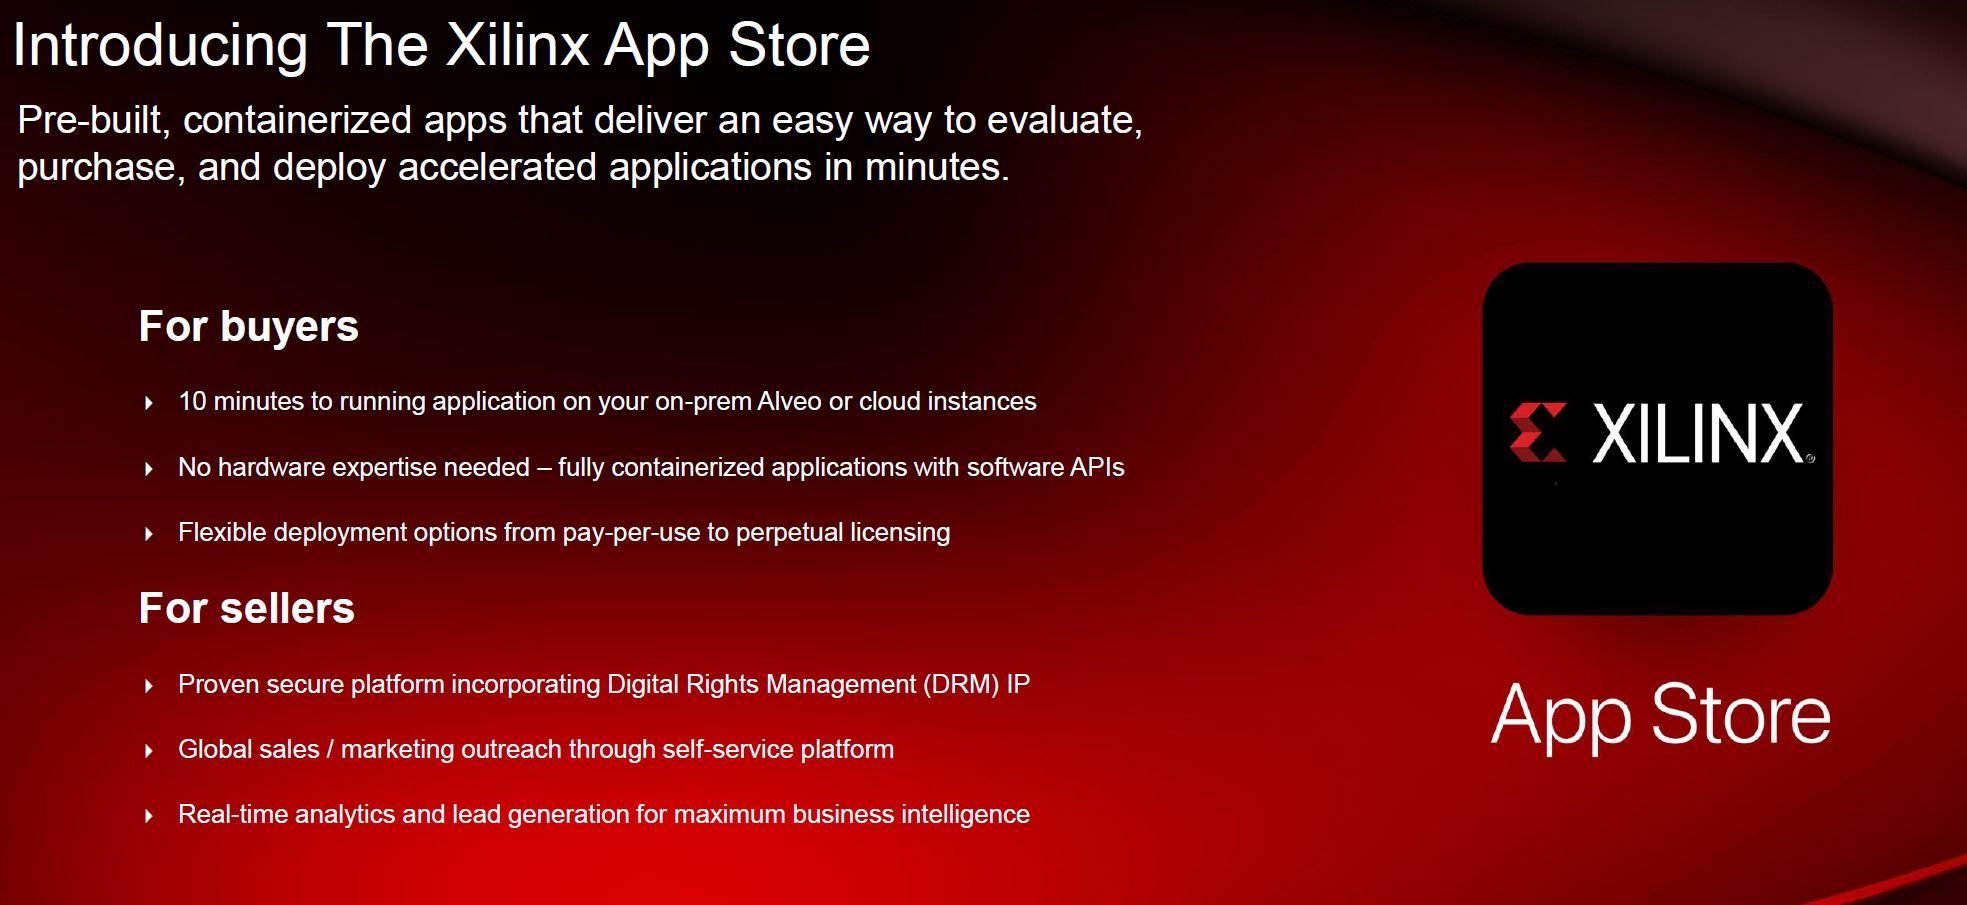 Xilinx App Store